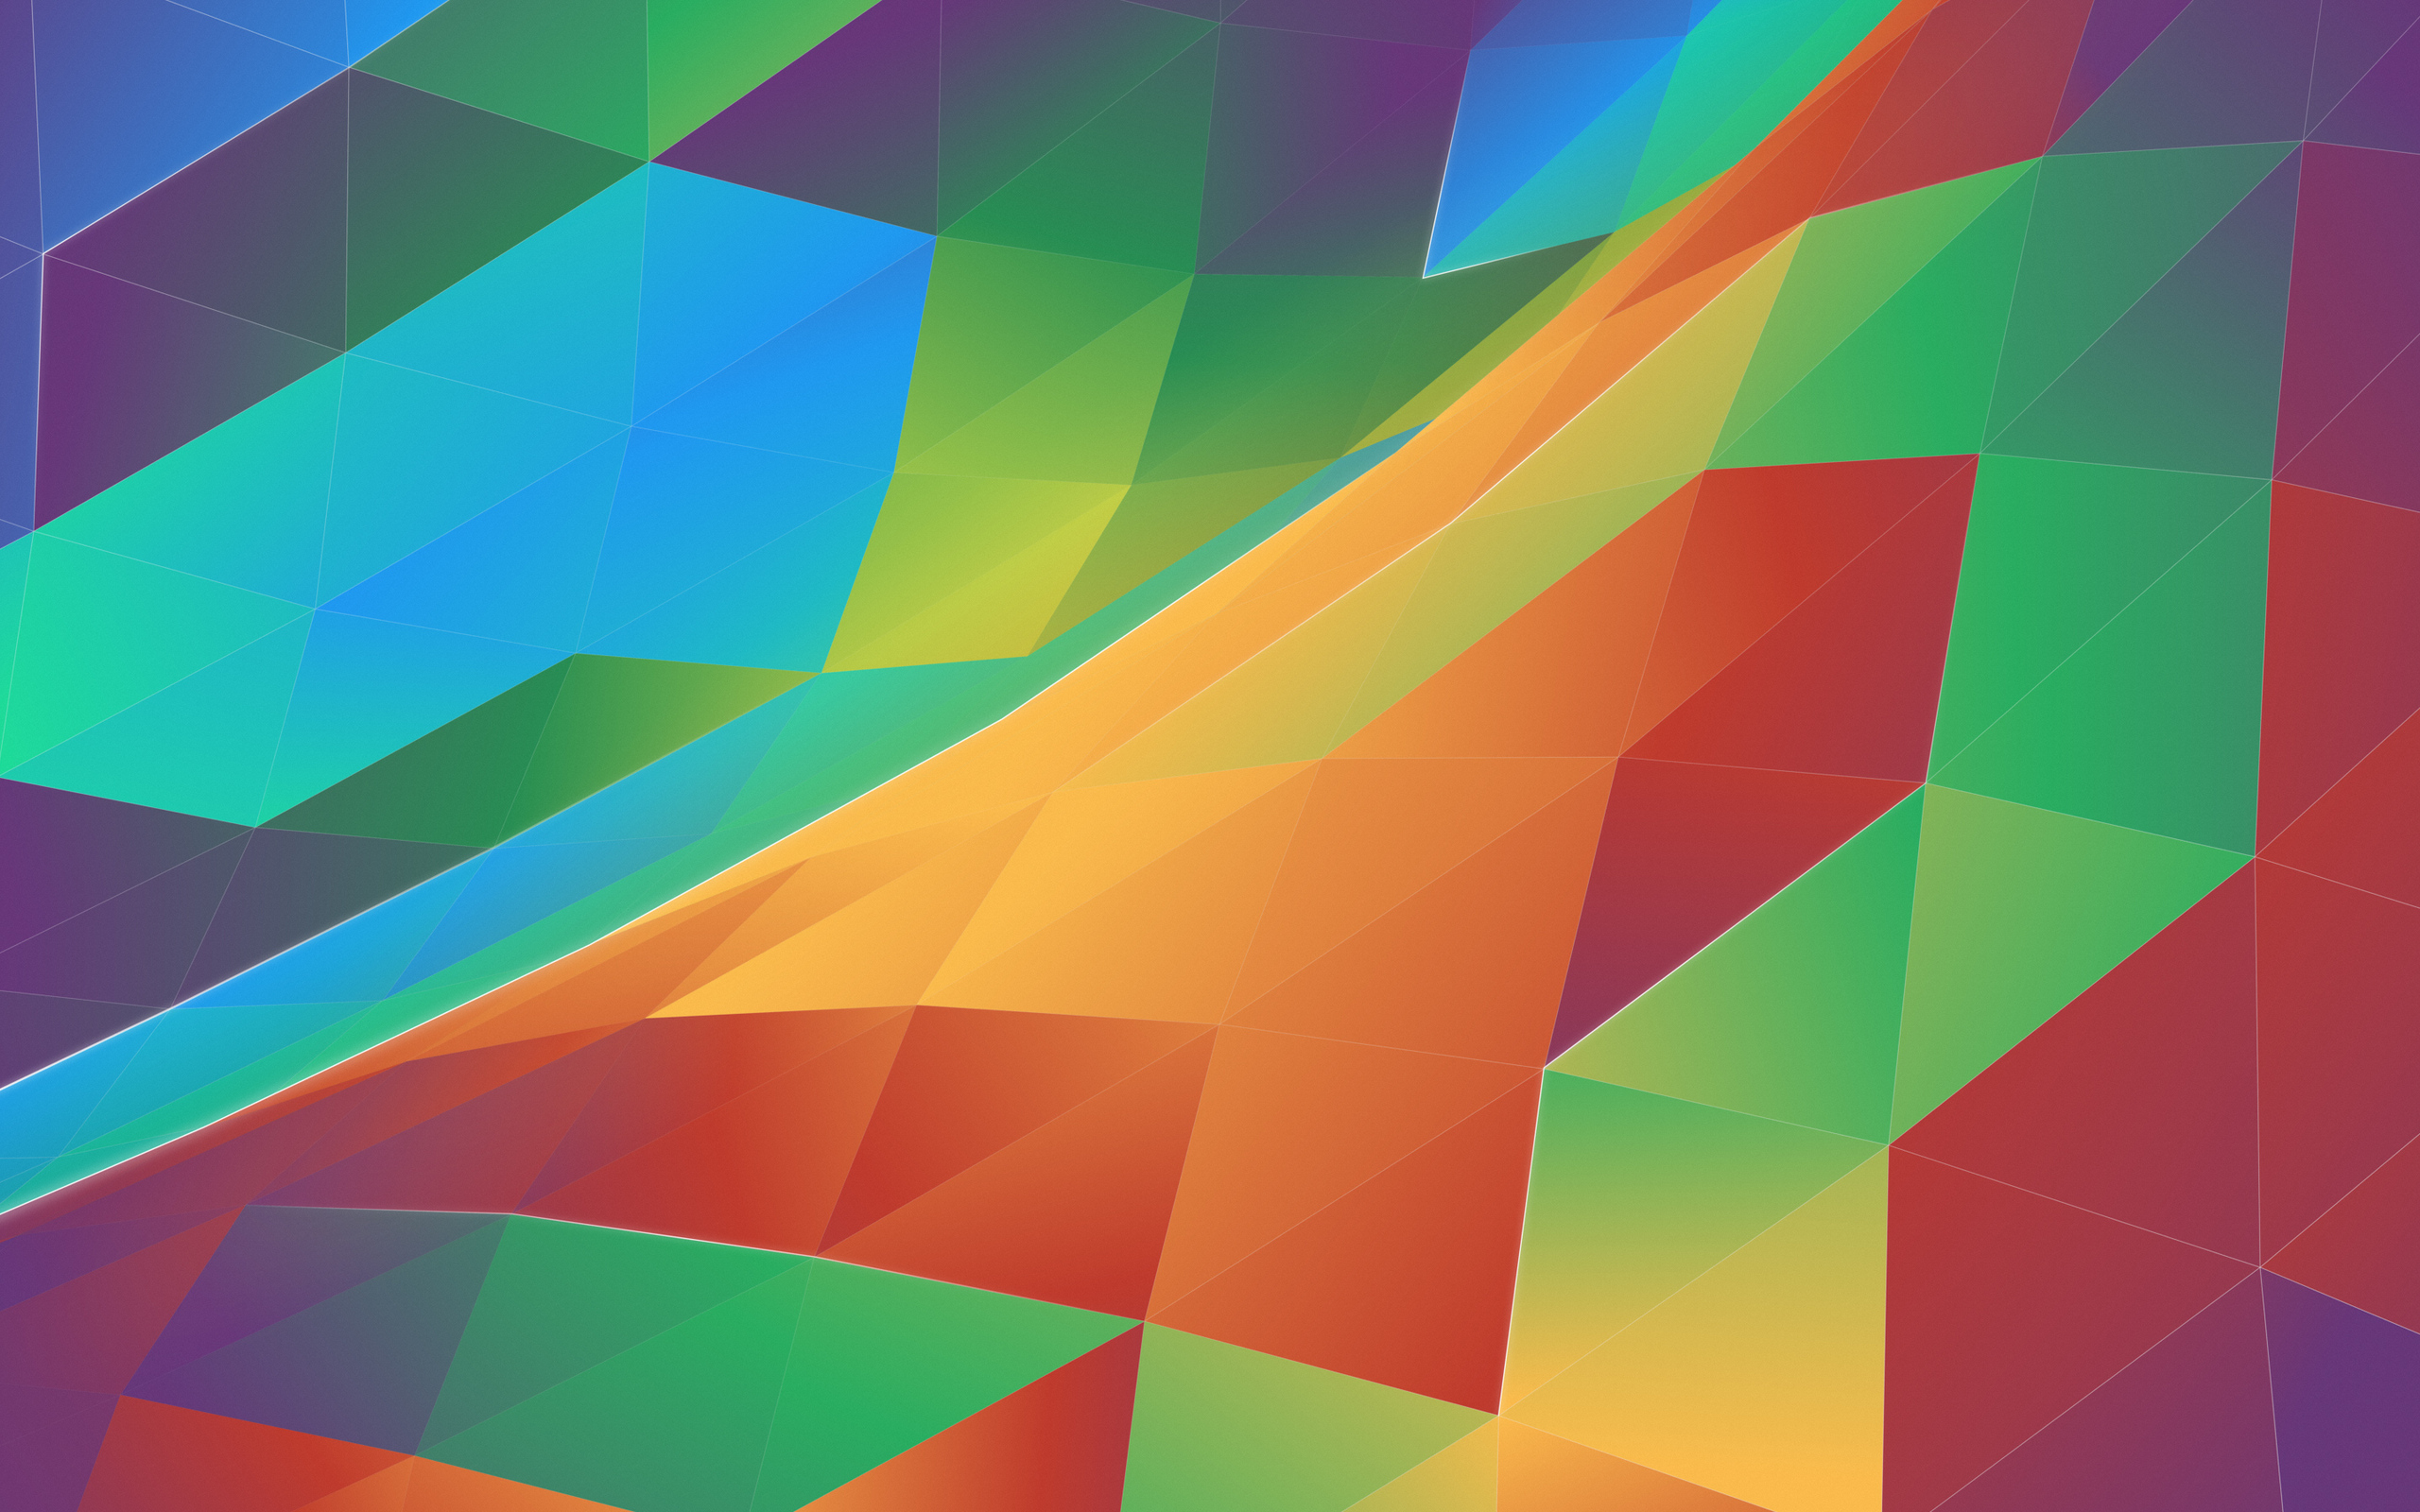 plasma-colorfull-triangle-4k-b9.jpg